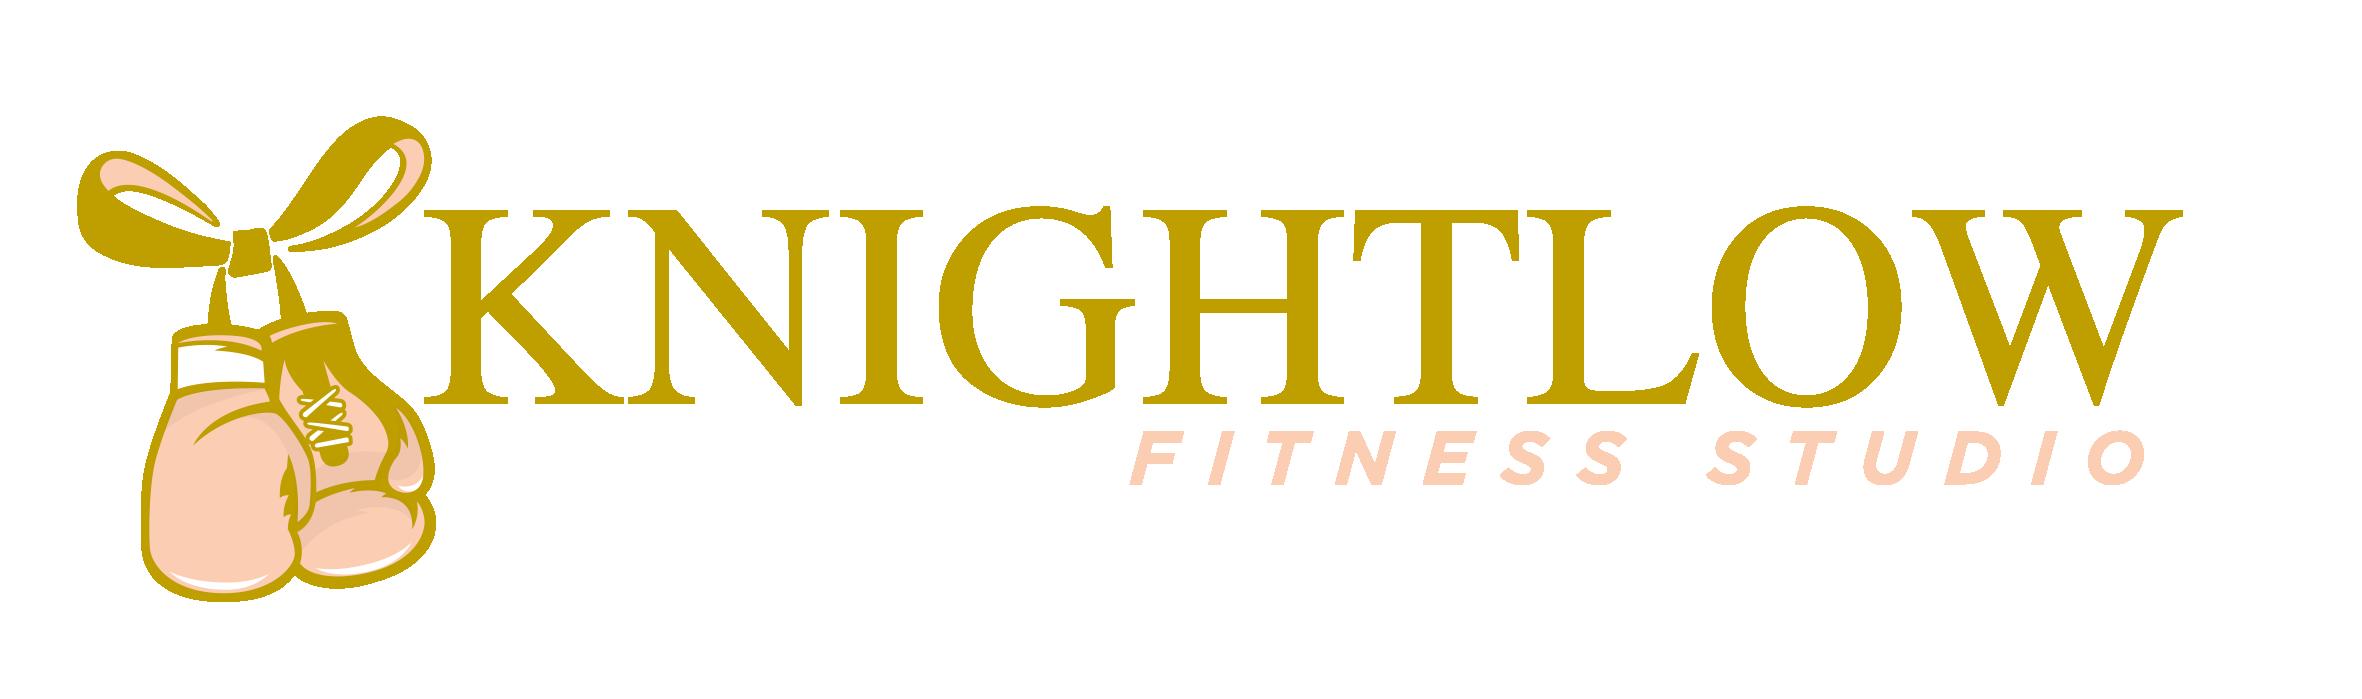 Knightlow Fitness Studio